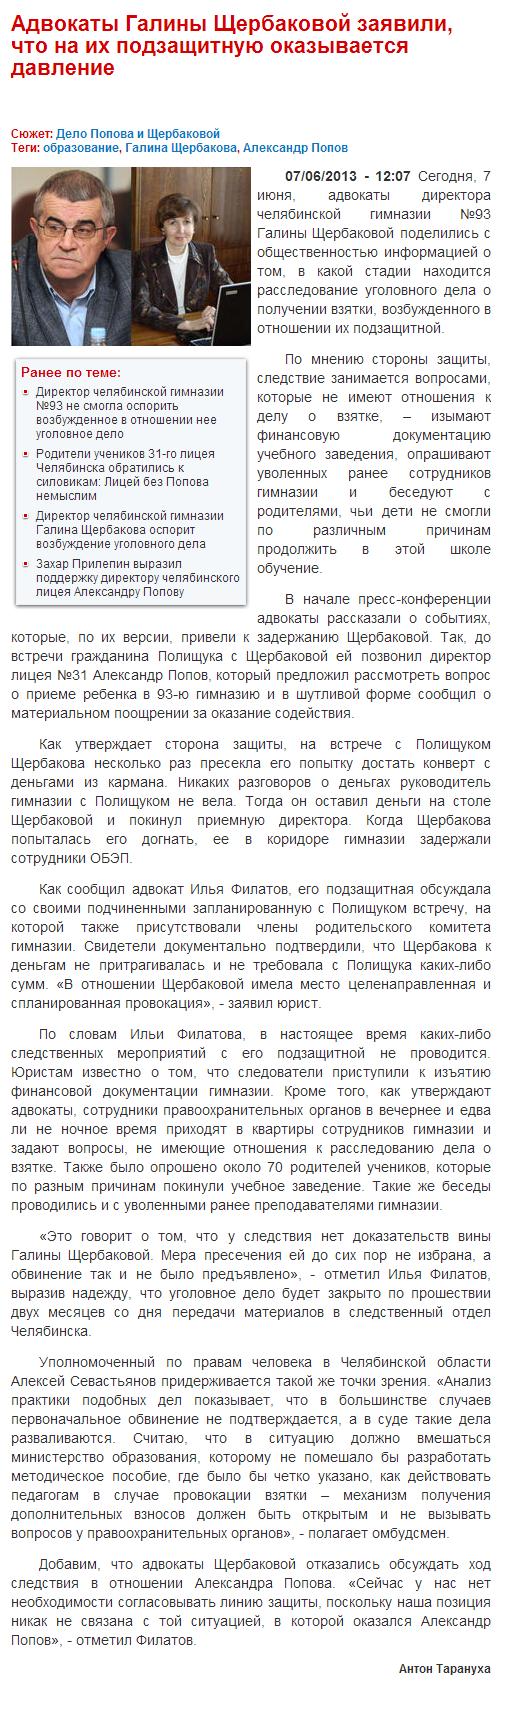 2014-09-01_125357